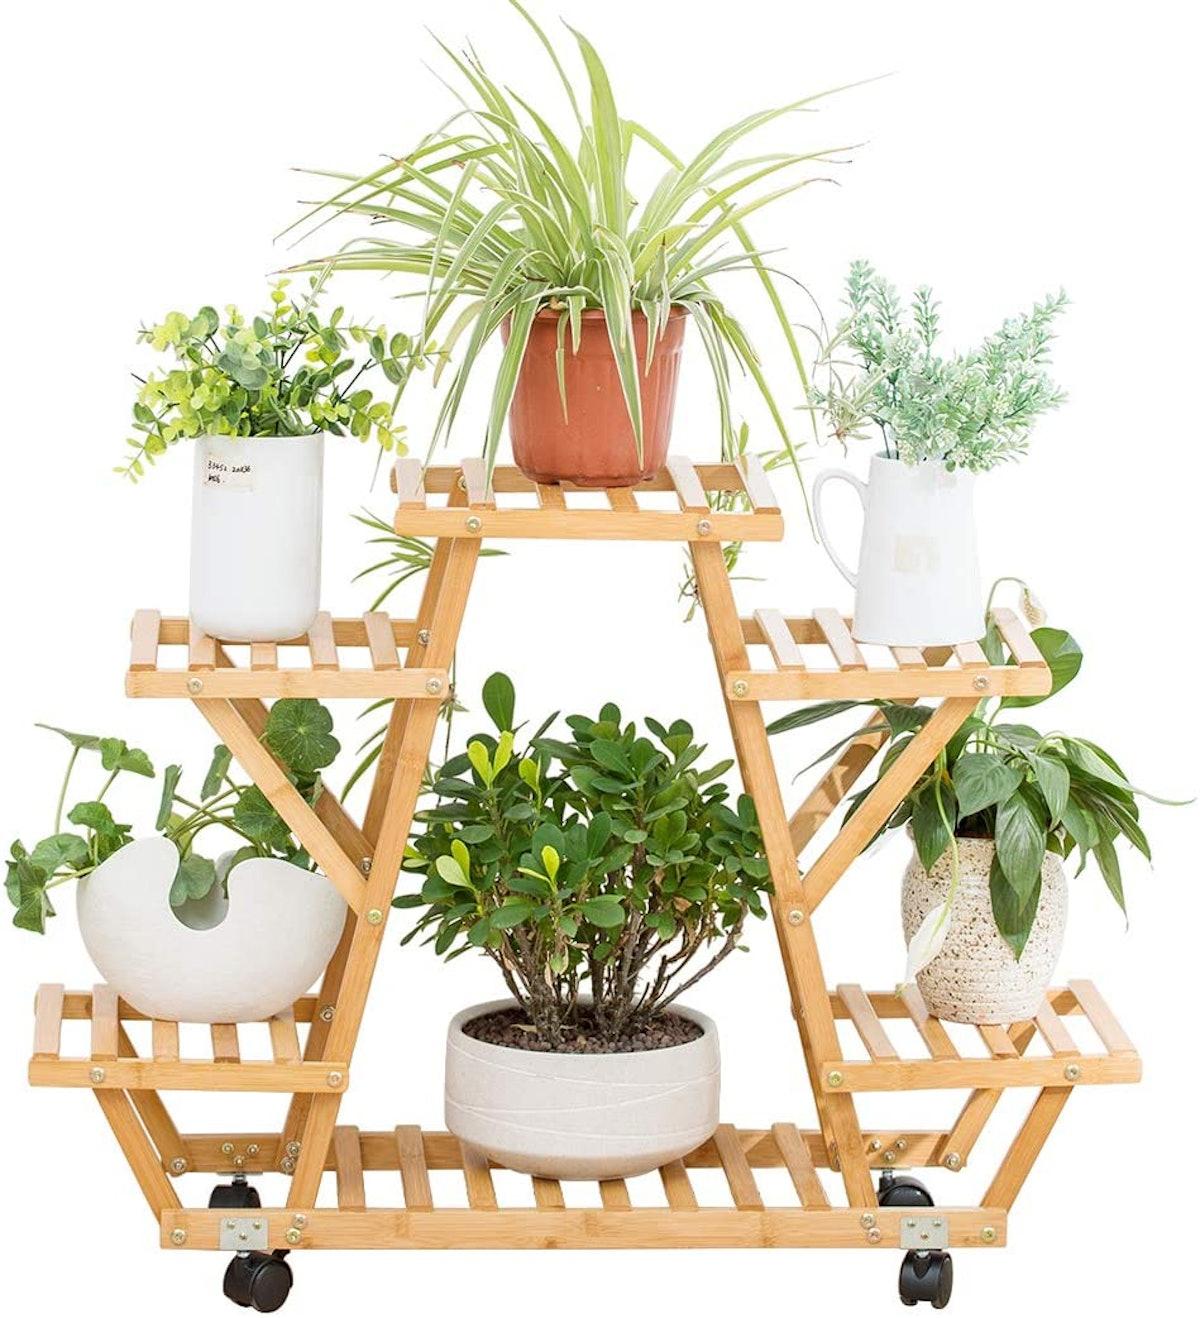 COPREE Bamboo Rolling Shelf Cart